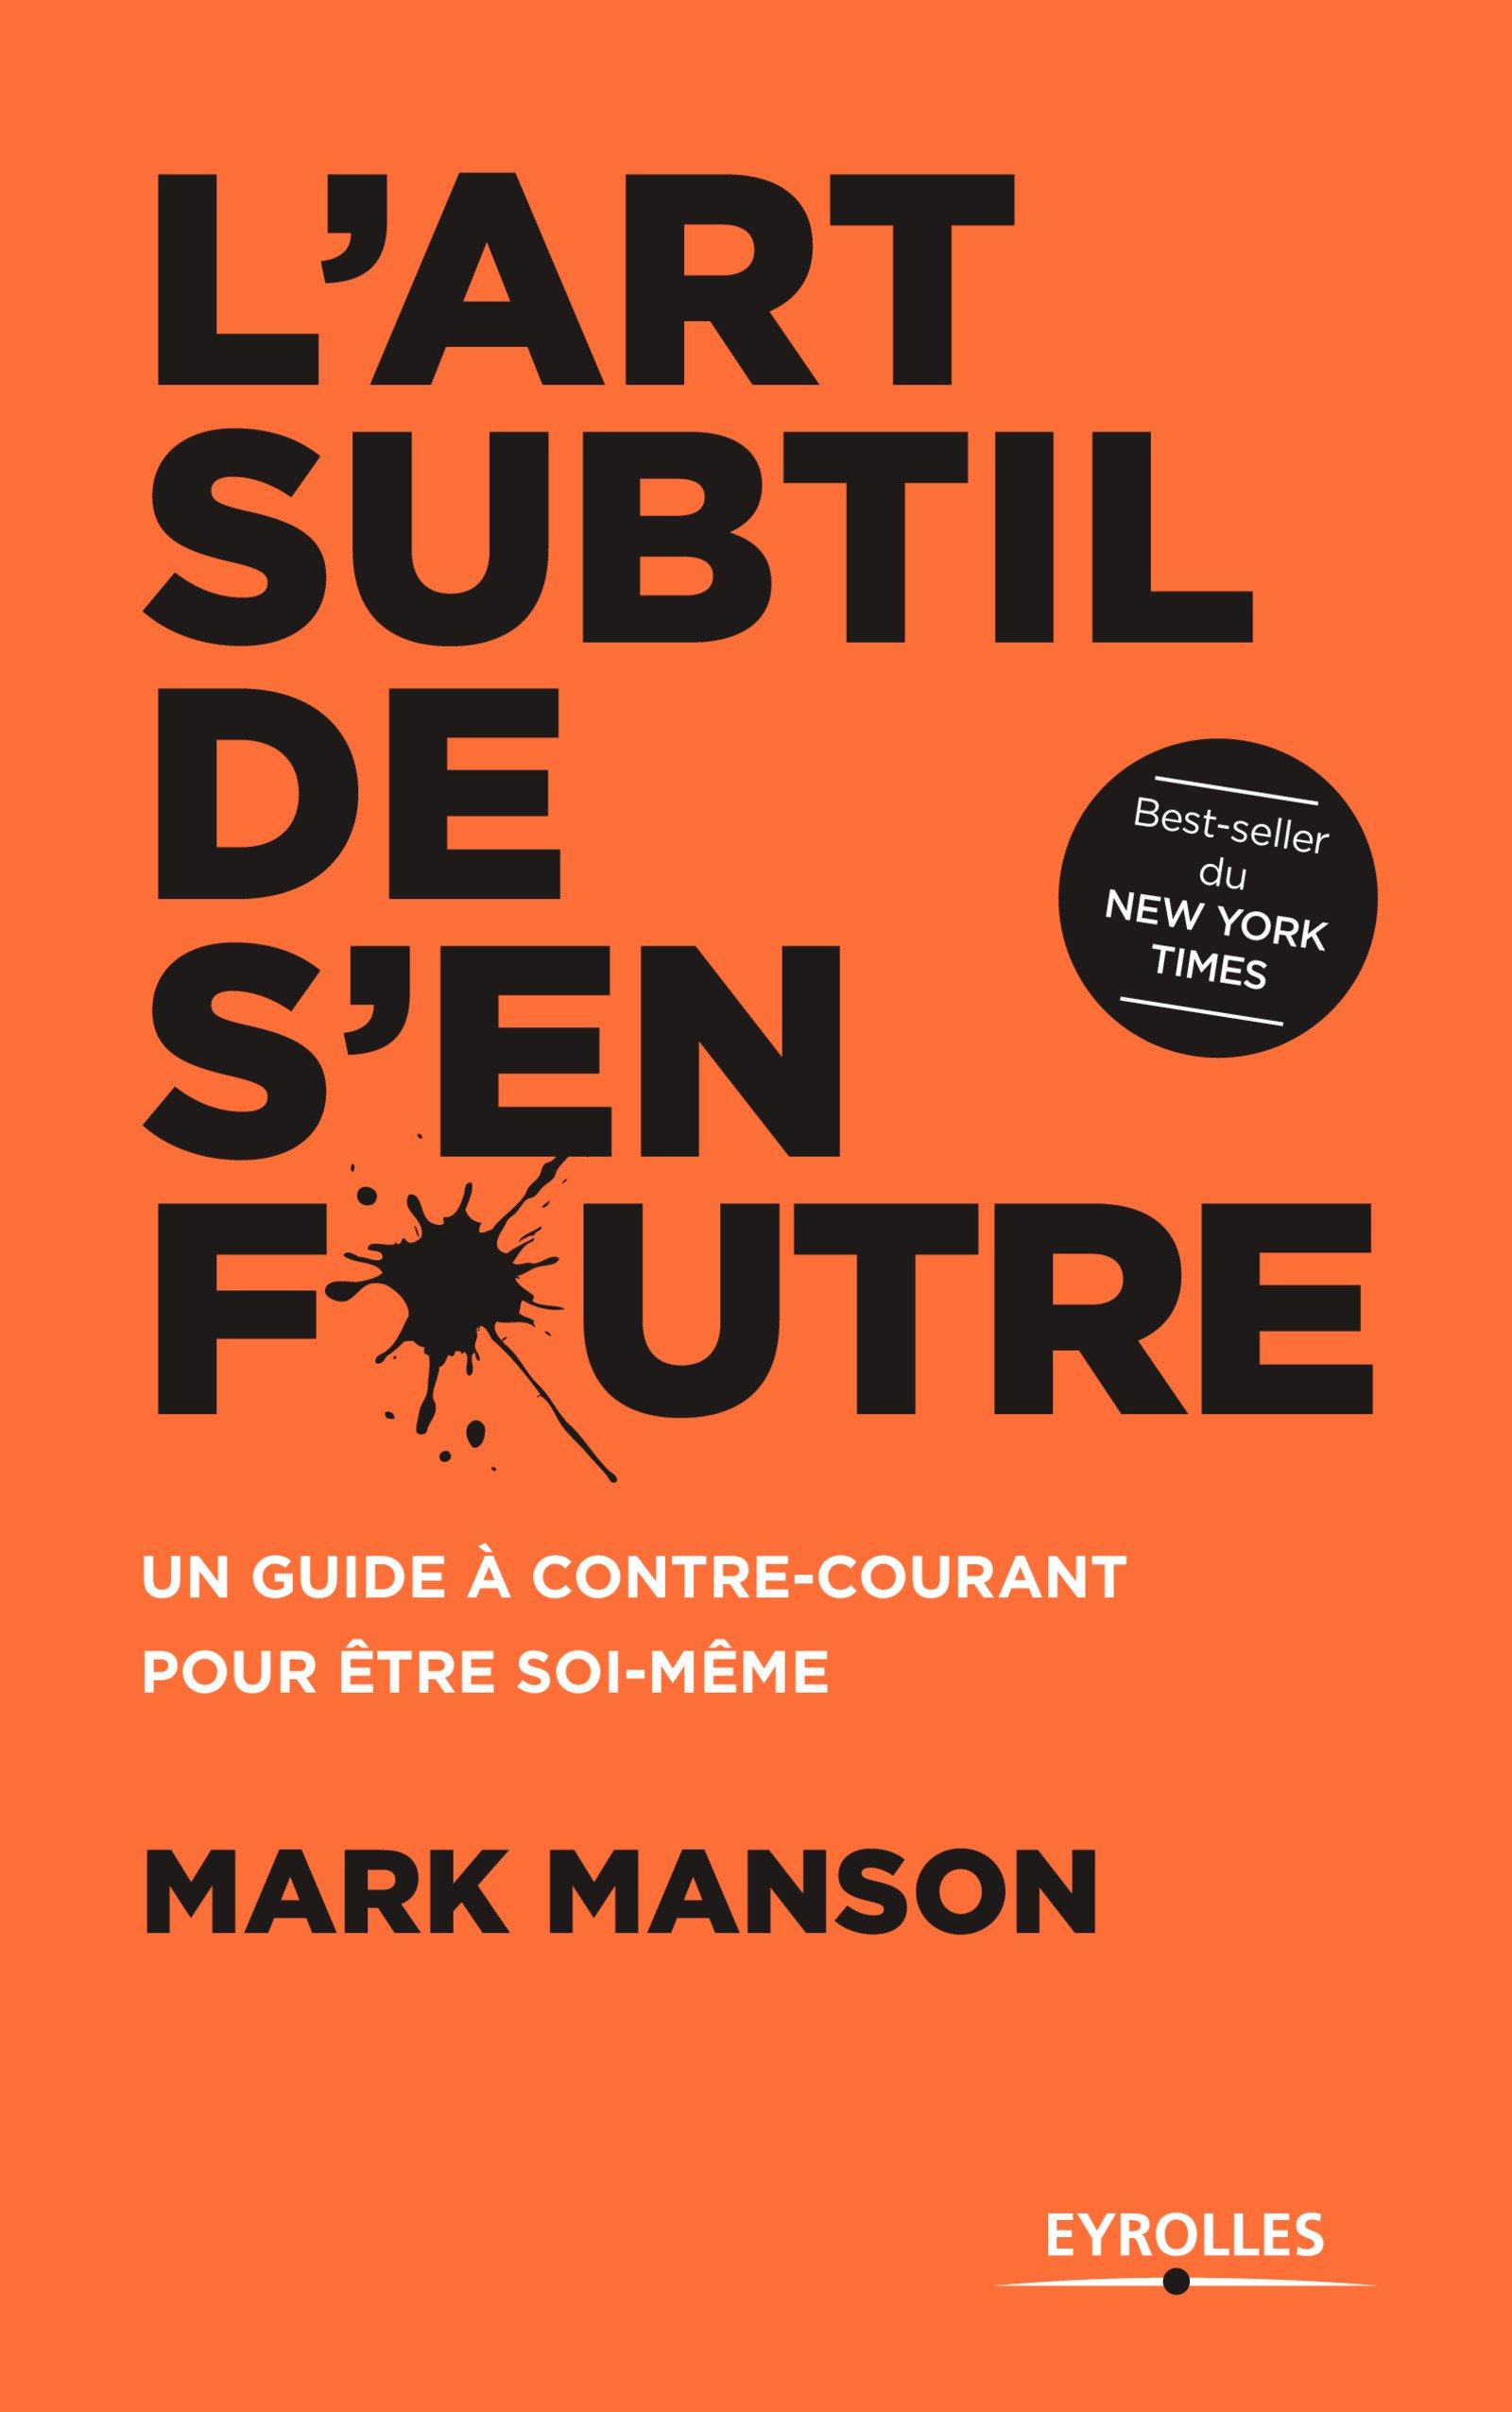 L'art subtil de s'en foutre: Amazon.es: Mark Manson: Libros en idiomas  extranjeros